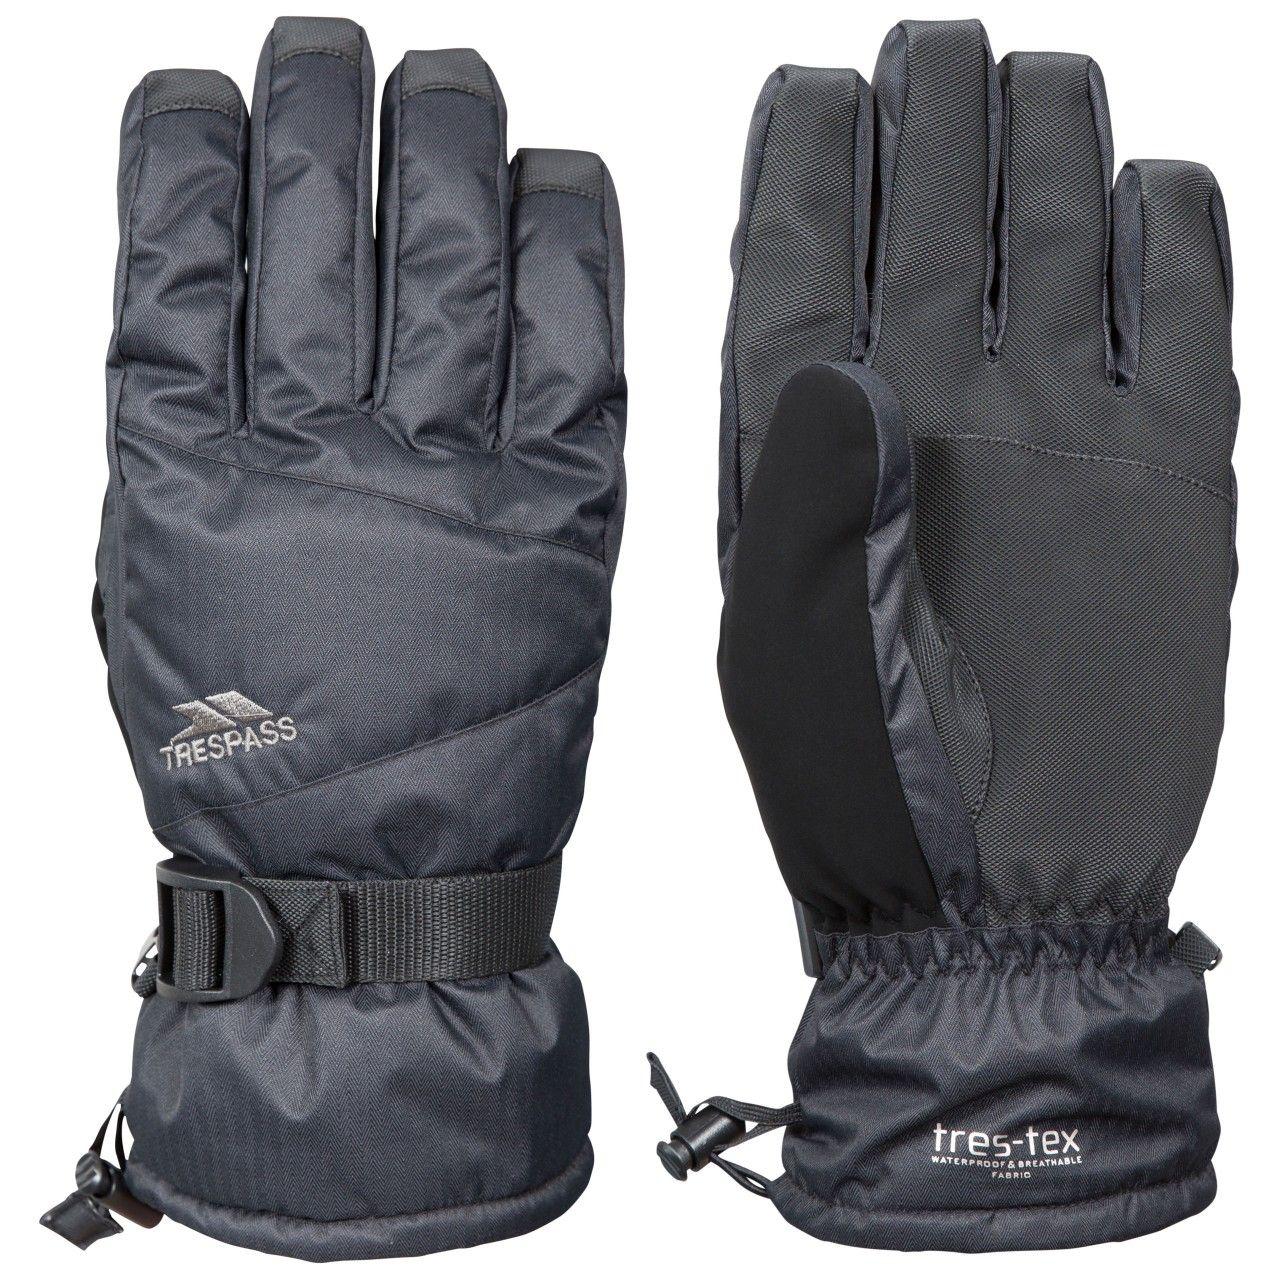 Trespass Mens Punch Waterproof Ski Gloves